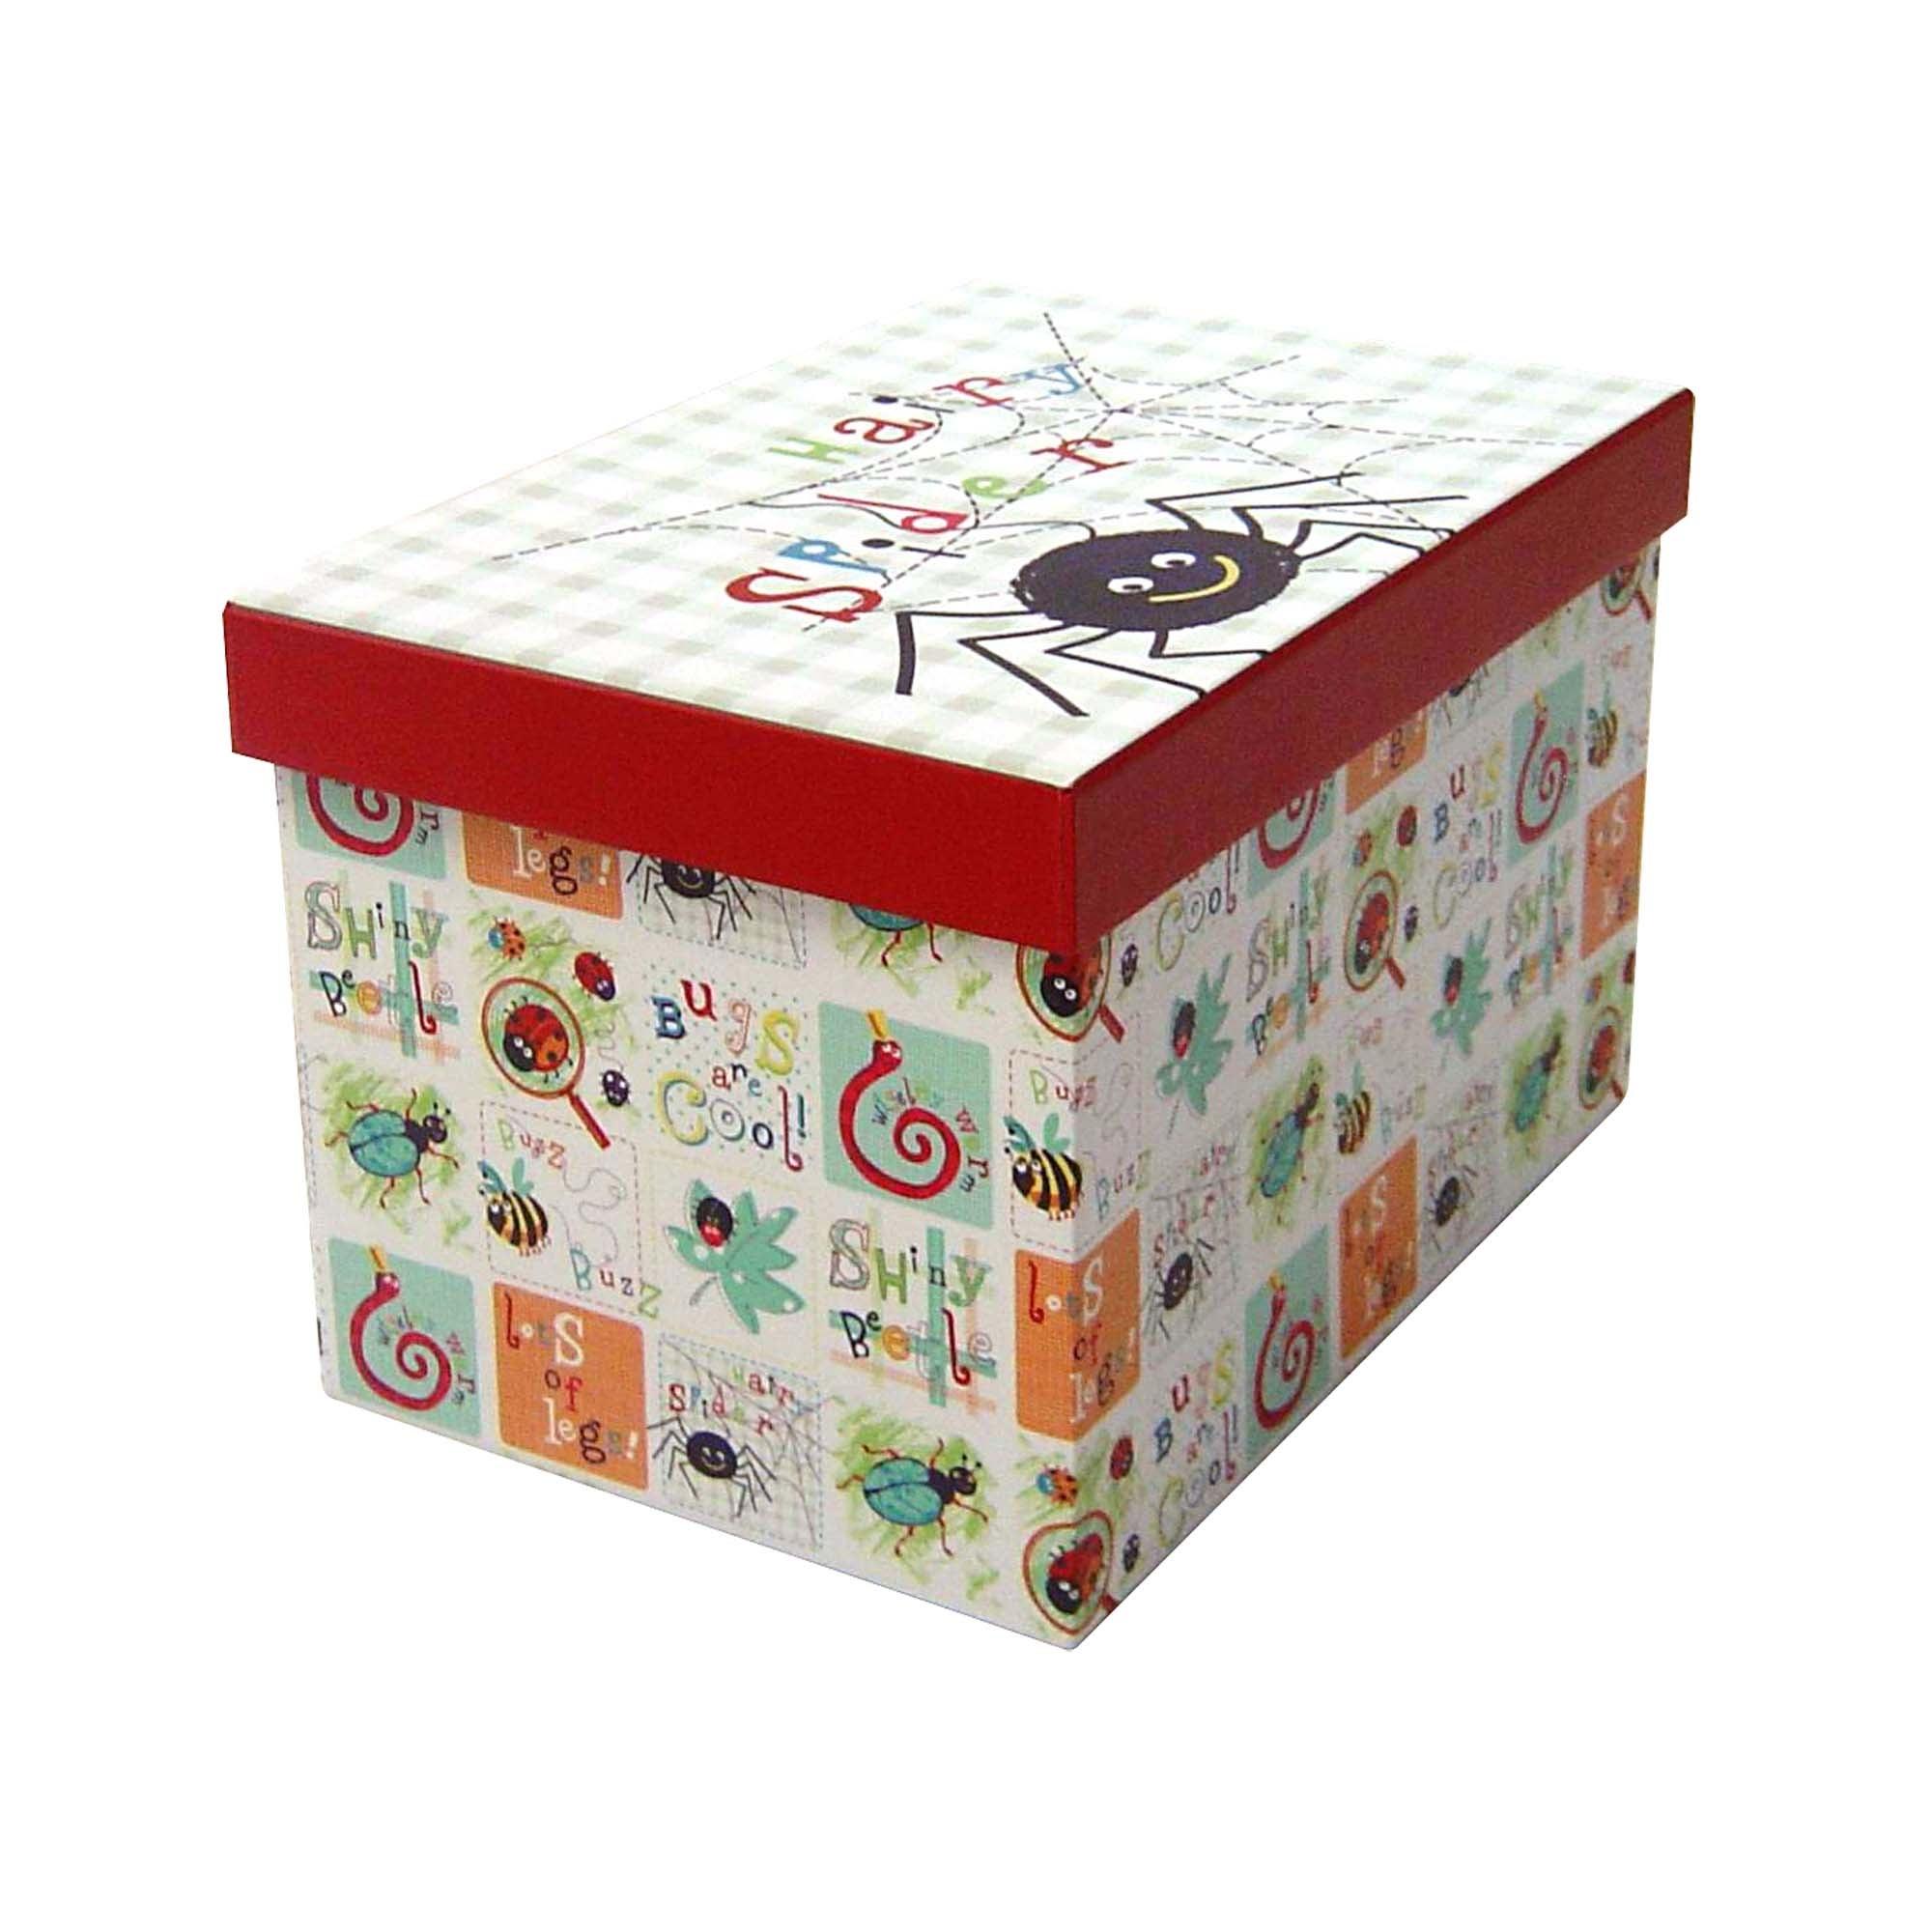 Bugs Storage Box